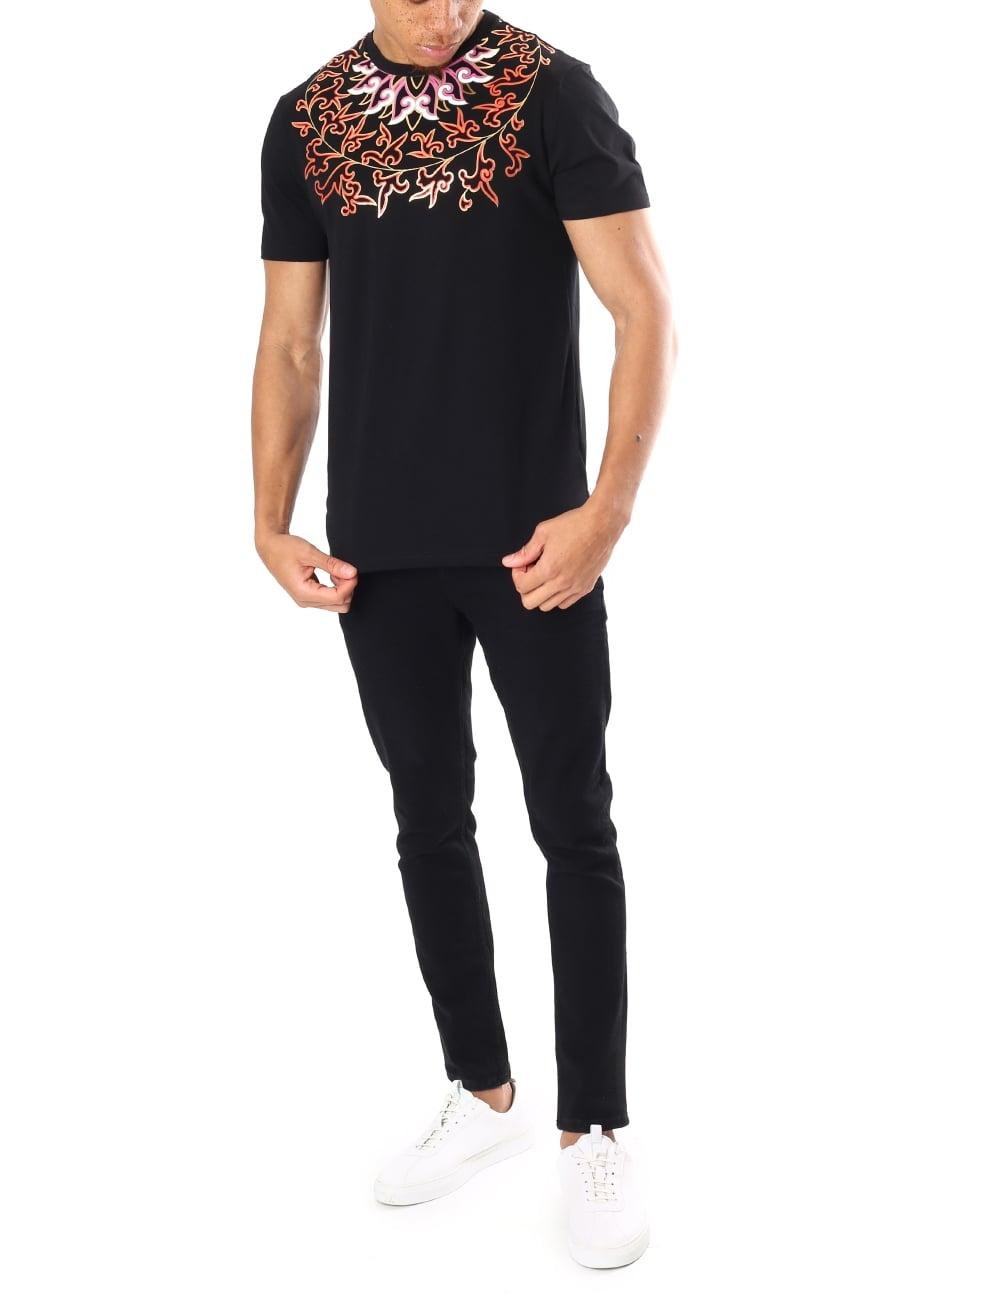 843aa9d6ed Versace Collection Men's Floral Print Crew Neck Short Sleeve T-Shirt